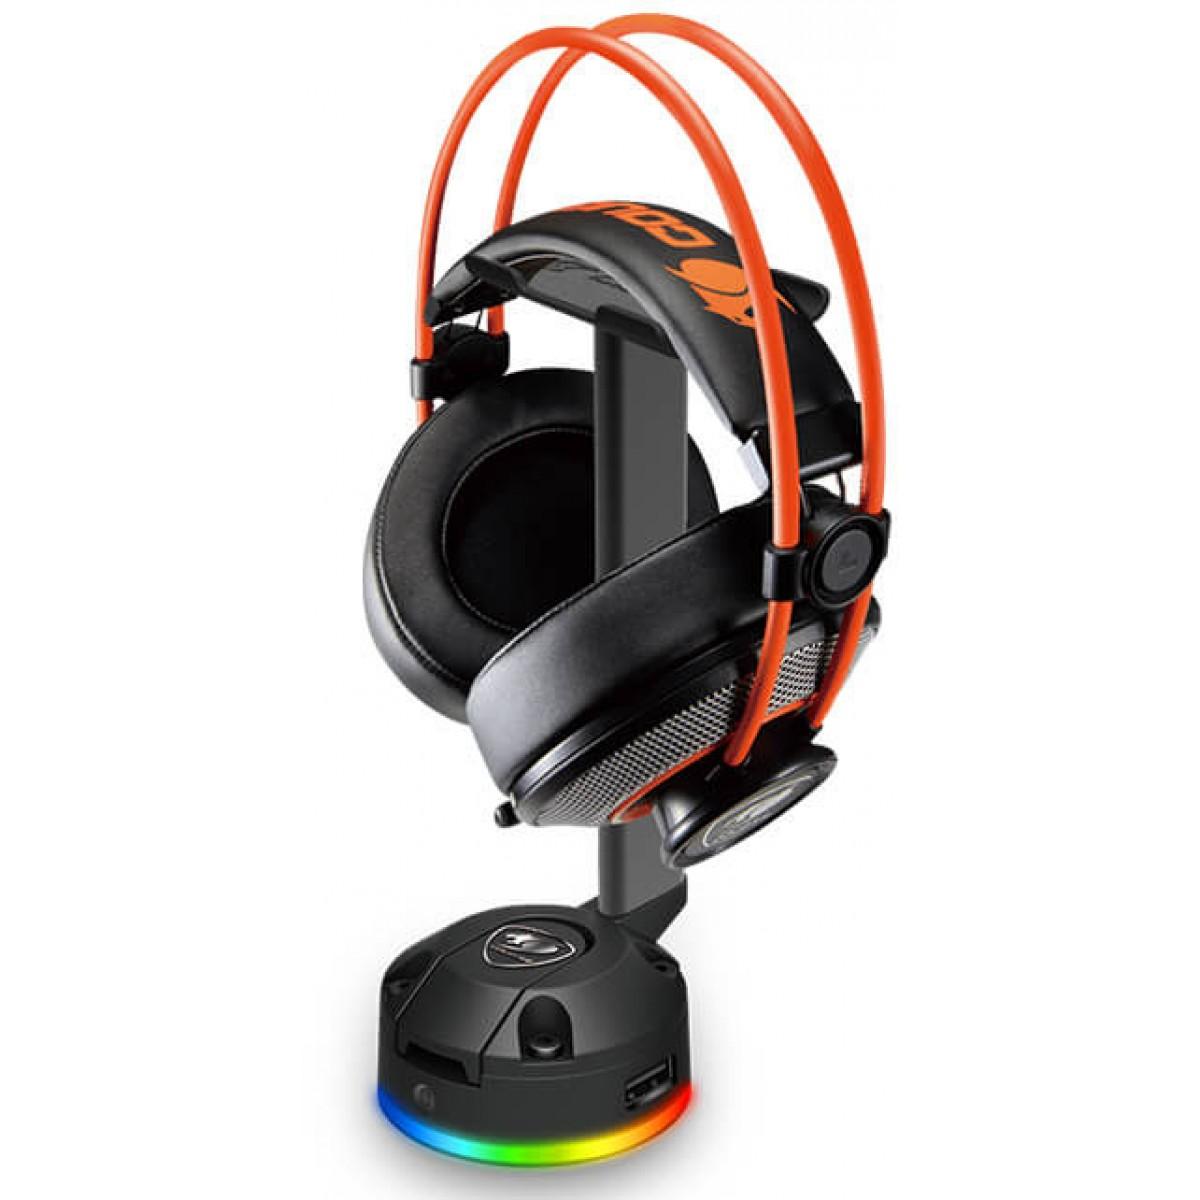 Suporte Para Headset Cougar Bunker S RGB, 3MBSRXXB-0001